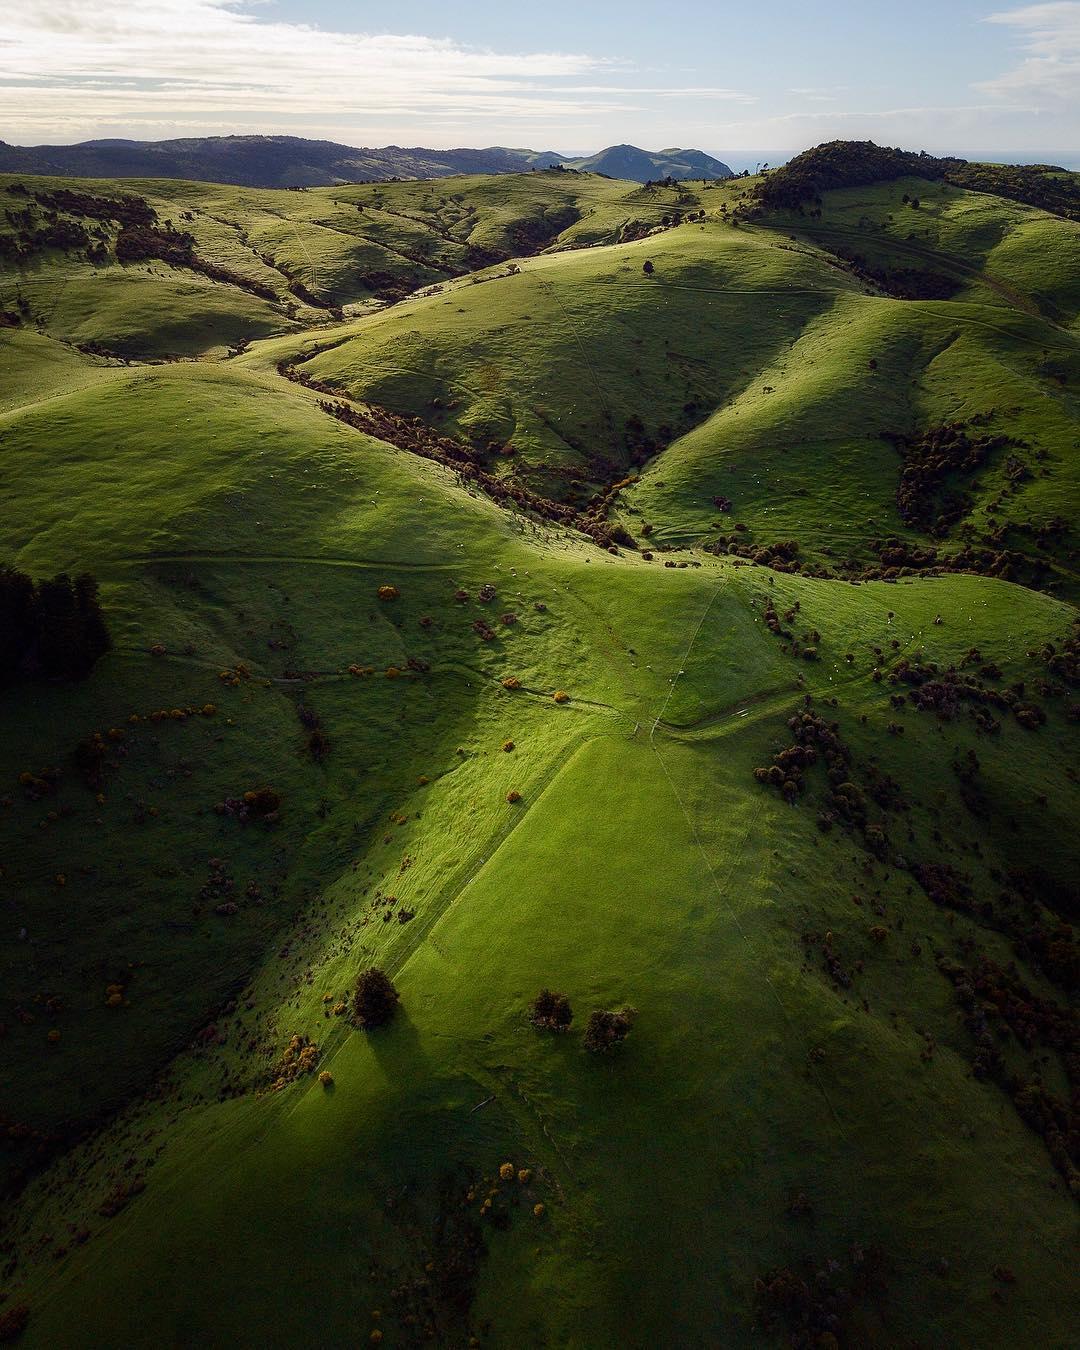 Пейзажи Австралии на аэрофотоснимках Джереми Герберта